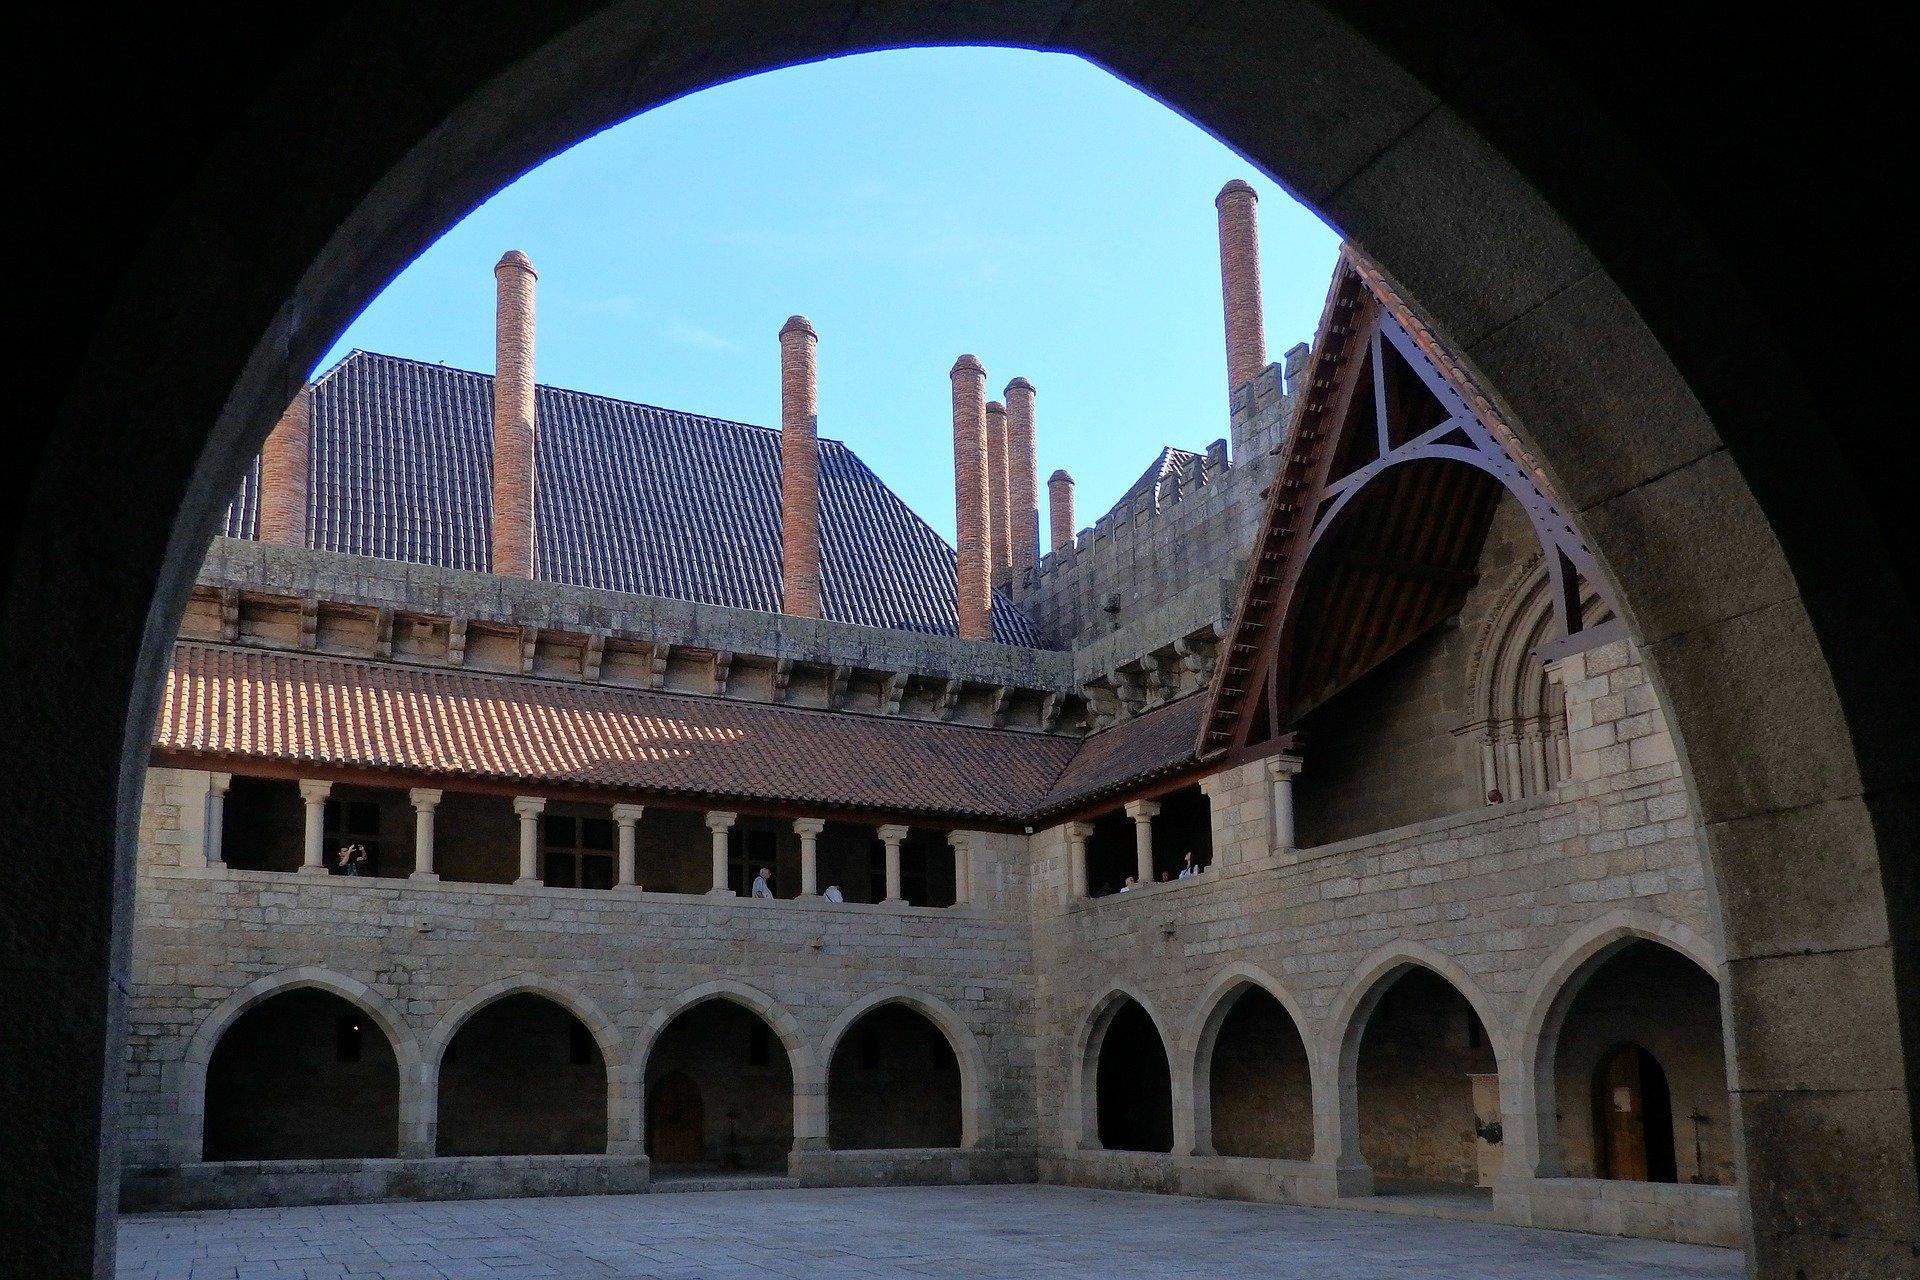 Дворец герцогов Браганса